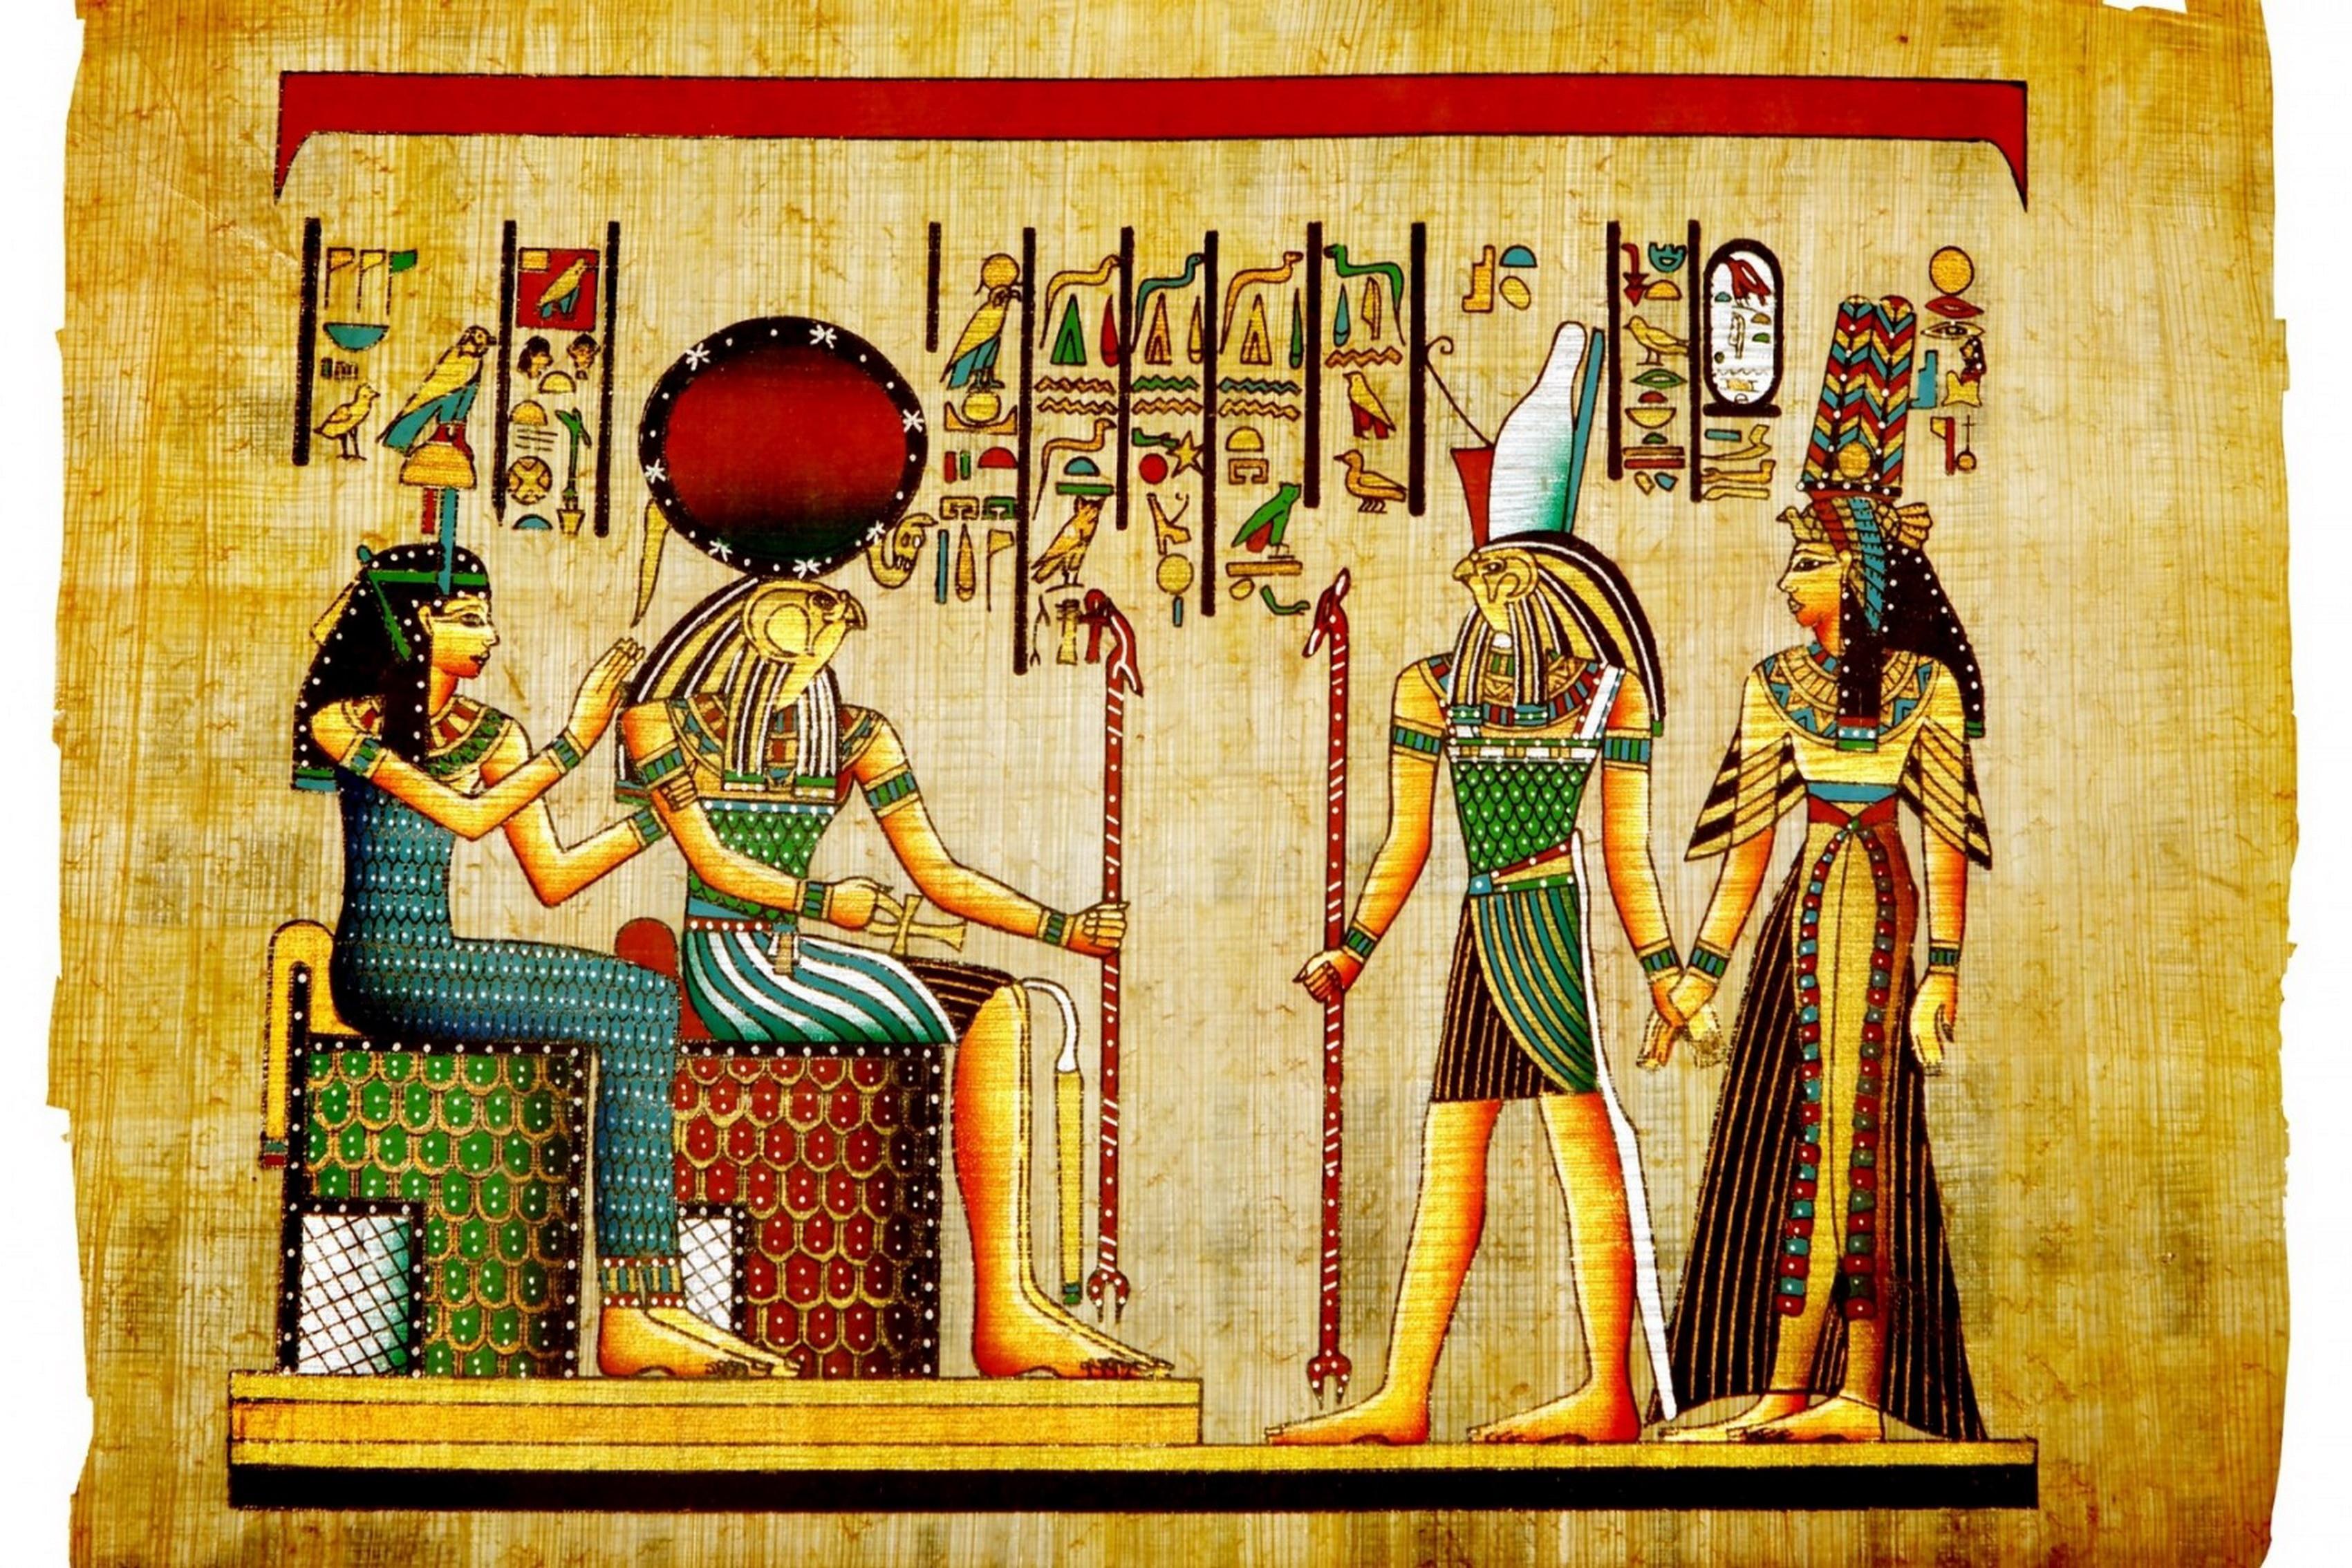 Egypt Papyrus Pharaoh Character Paint Living Room Home Art